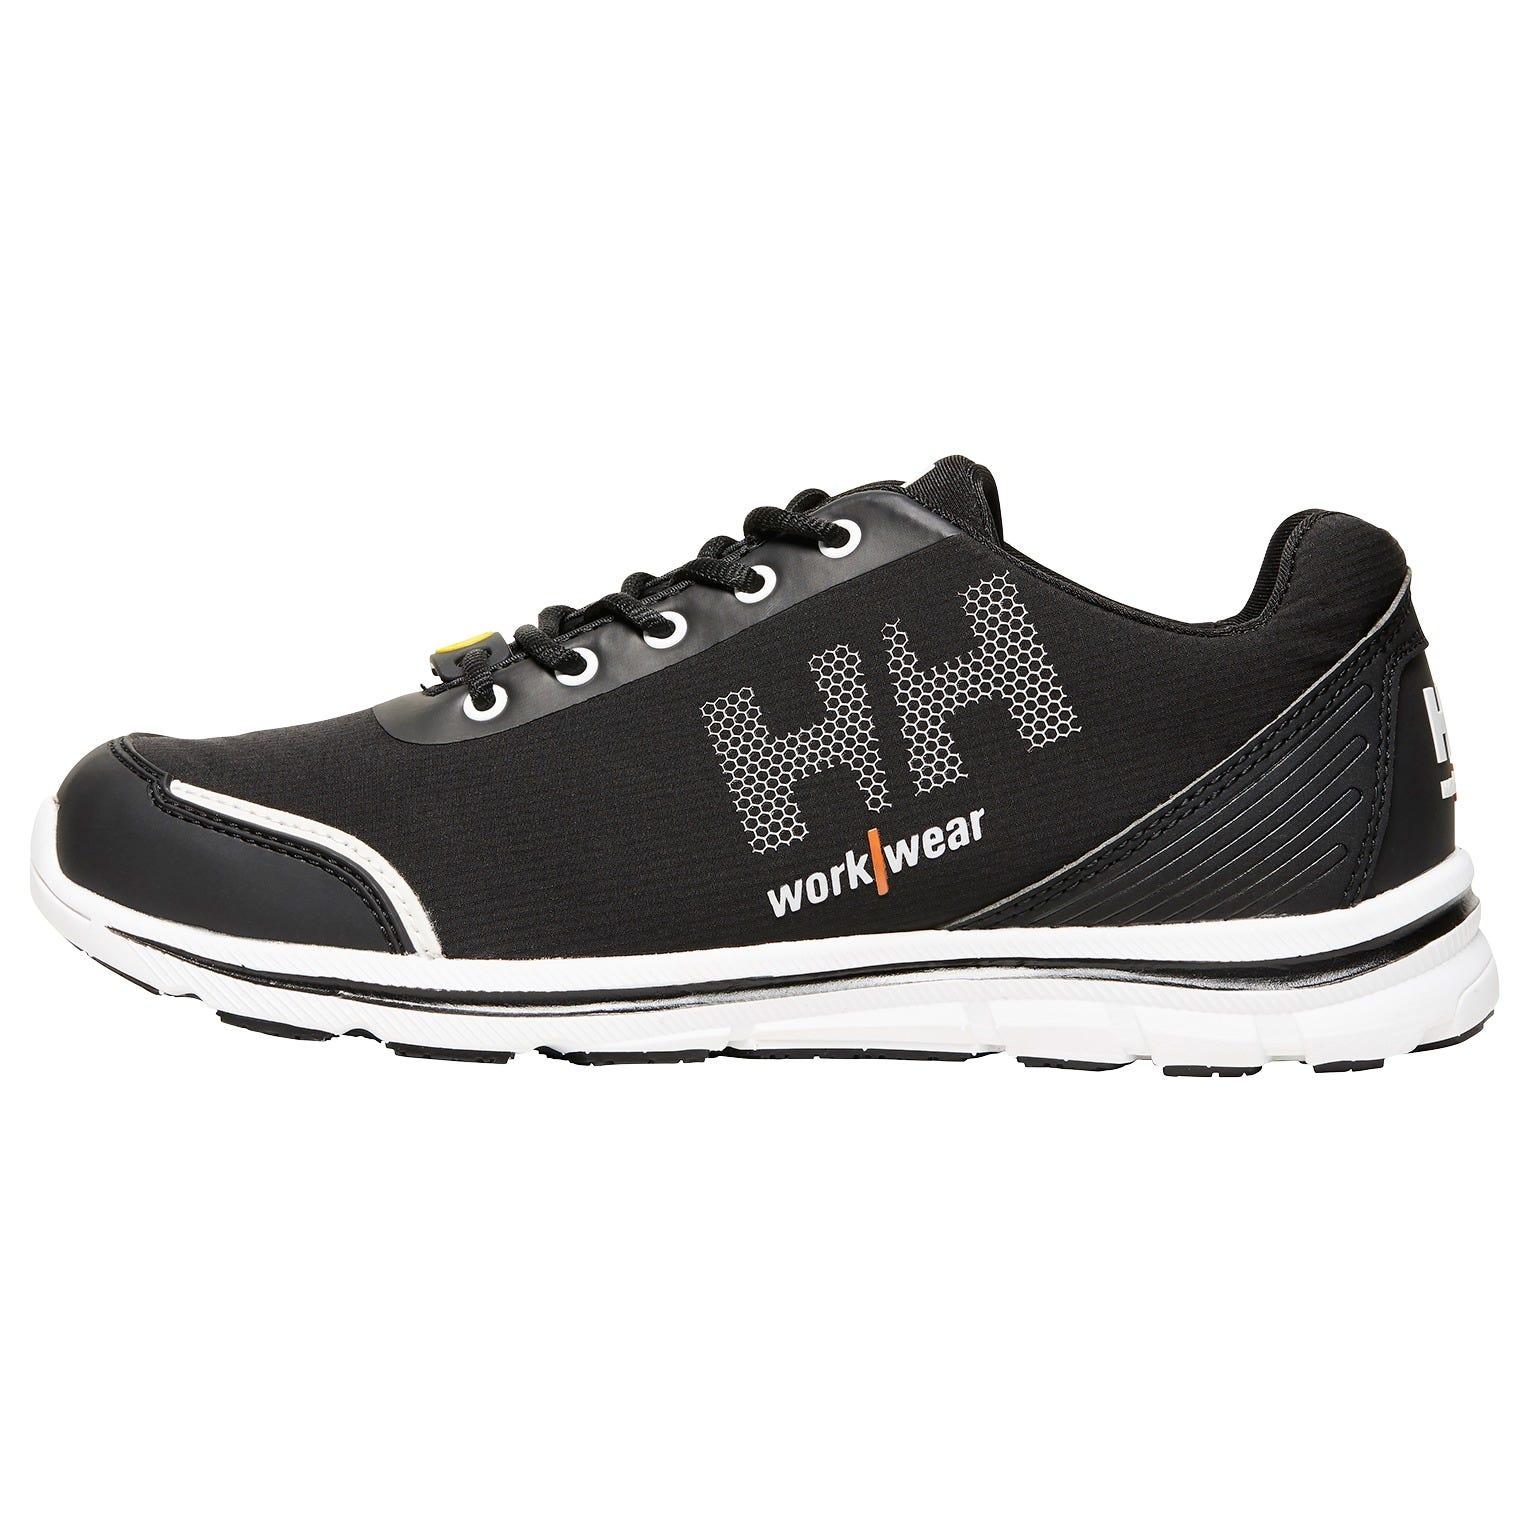 hh workwear workwear helly hansen scarpa antinfortunistica oslo st certificata o1 antiscivolo 41 nero